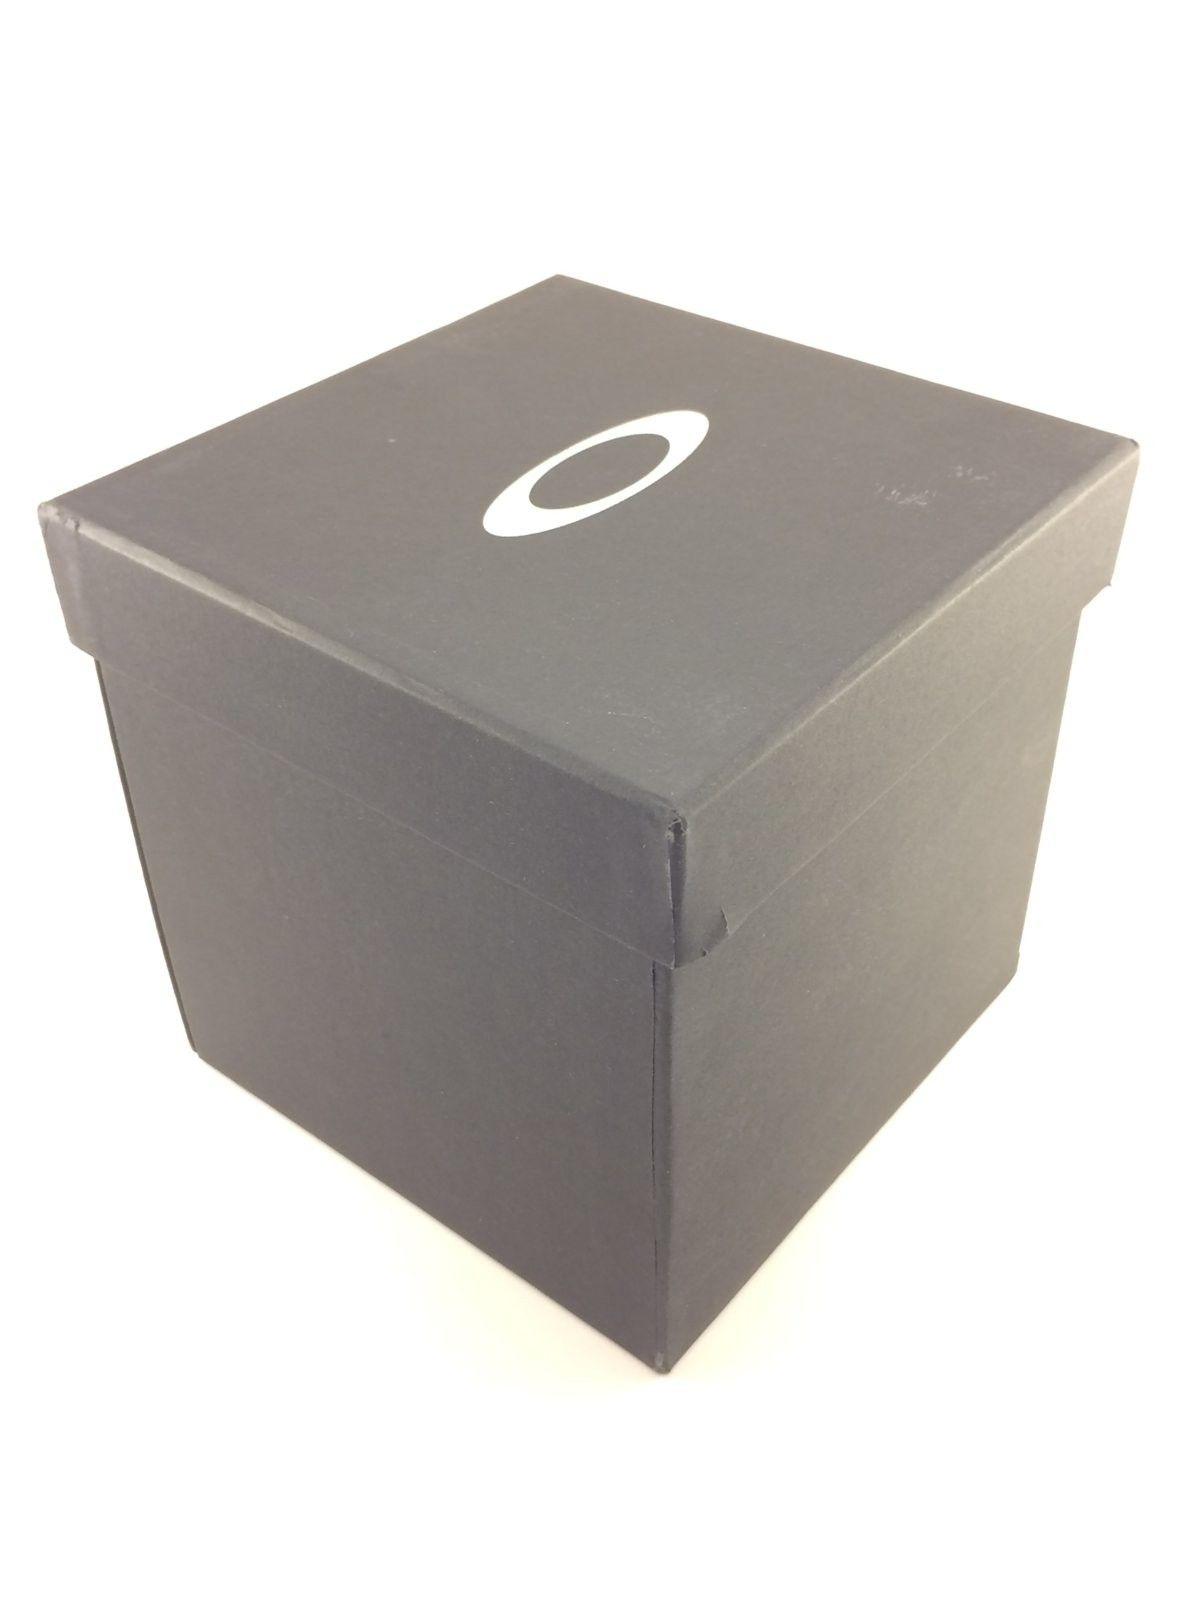 Hollow Point wooden box - HP box 10.JPG